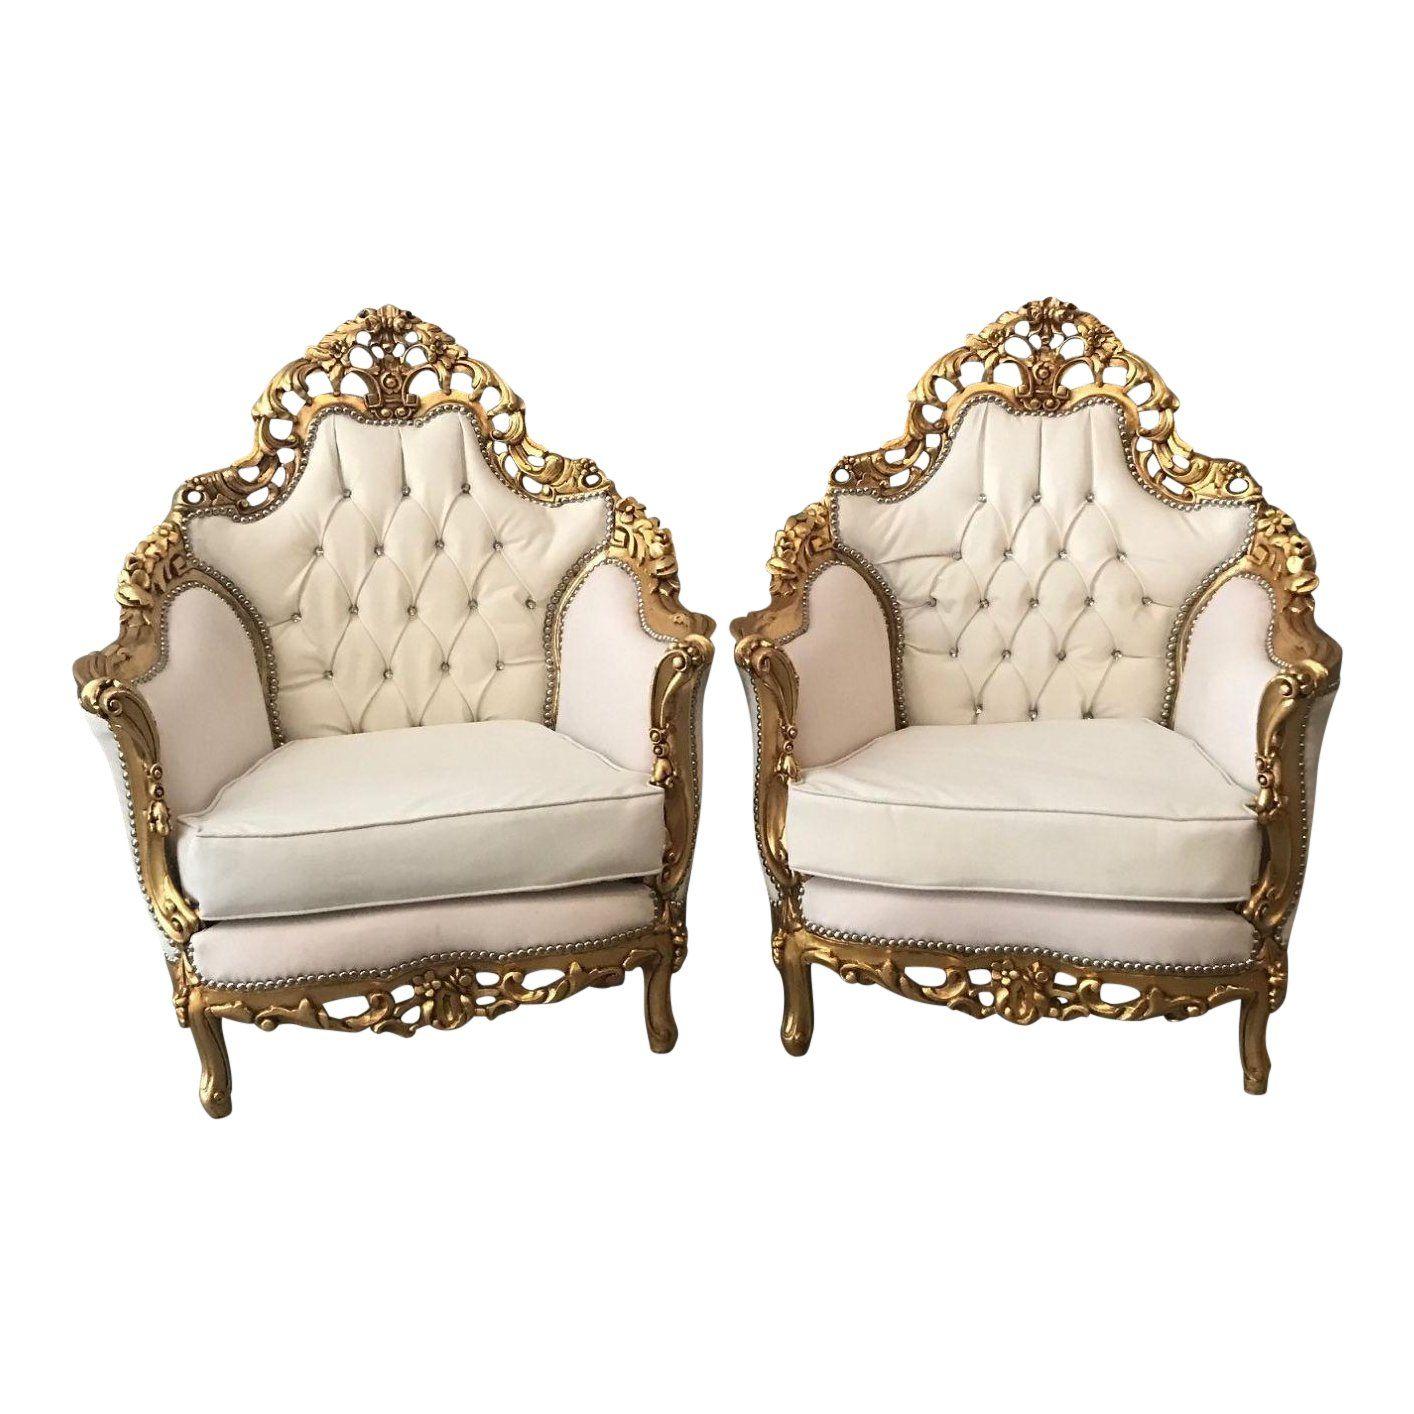 Antique Italian Rococo Single One Chair Chairish